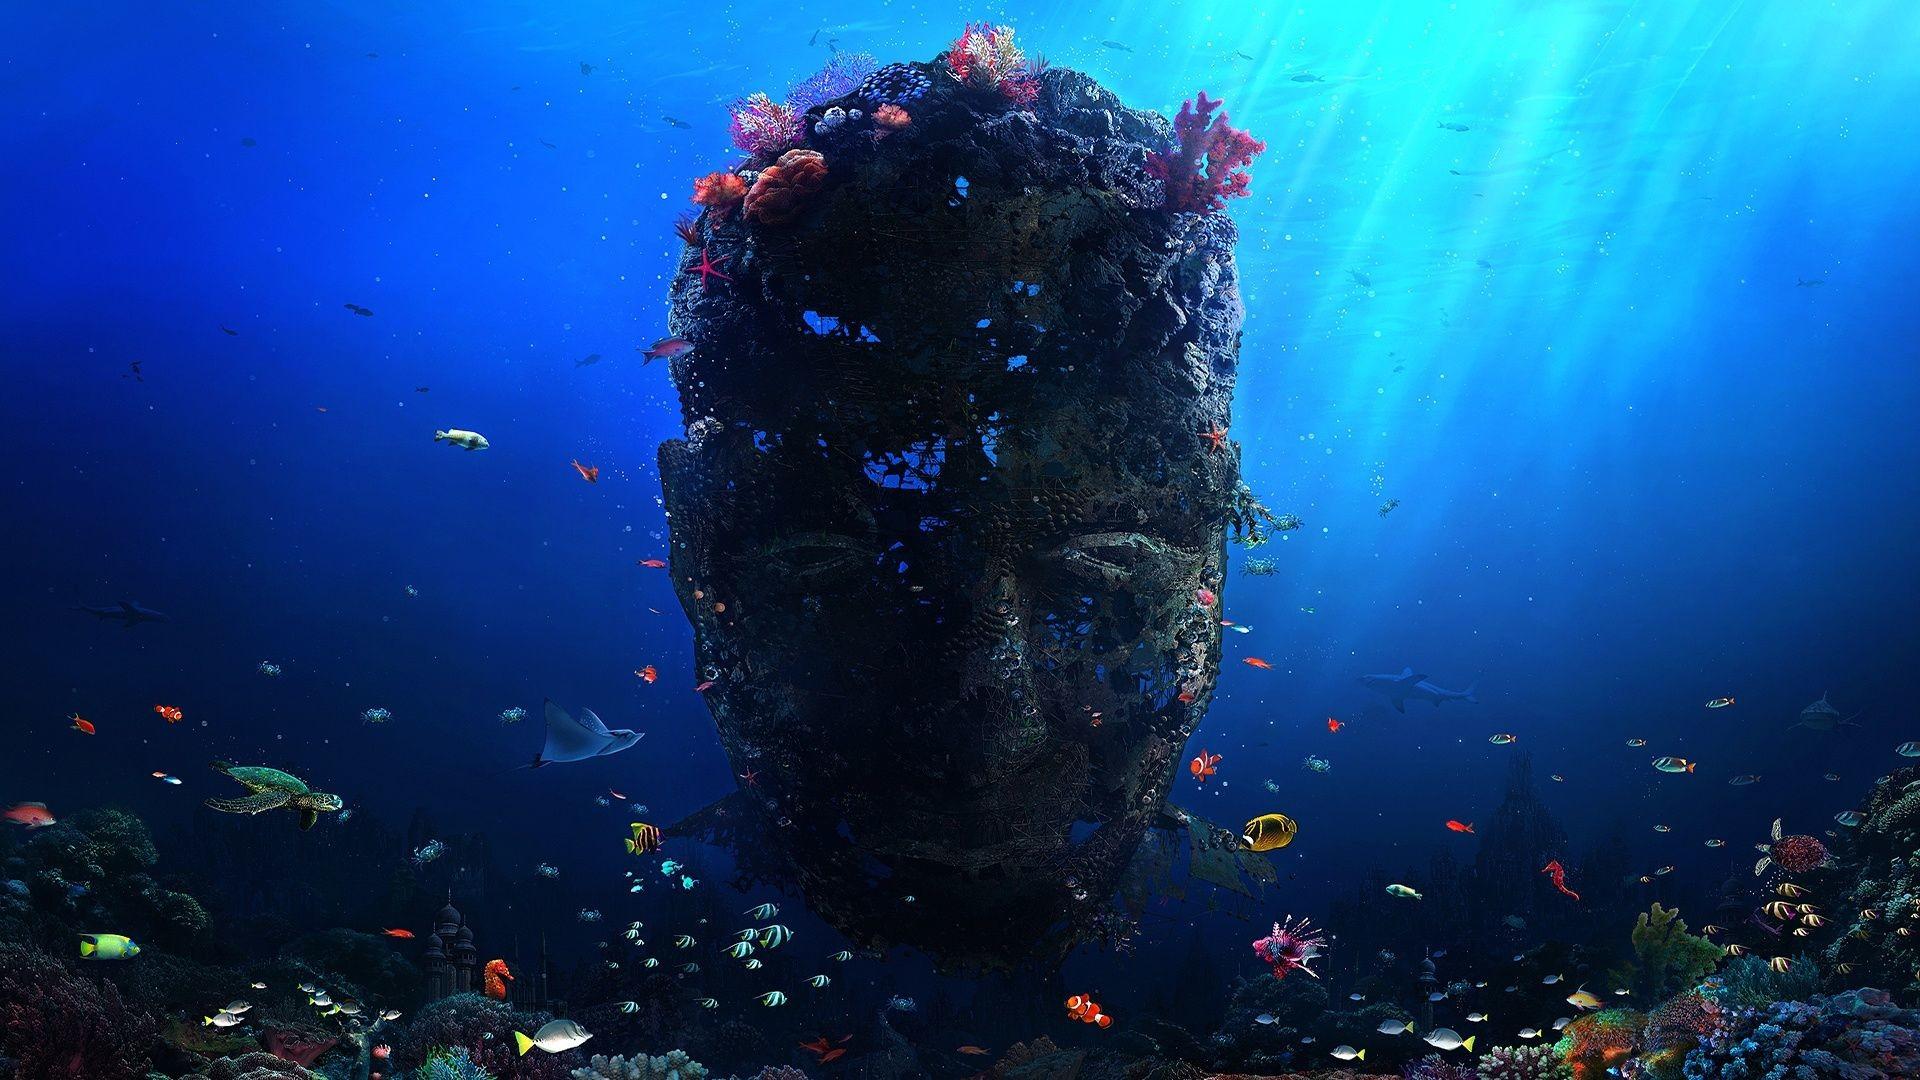 Coral Reef Wallpaper – HD Wallpapers · wapelper.com